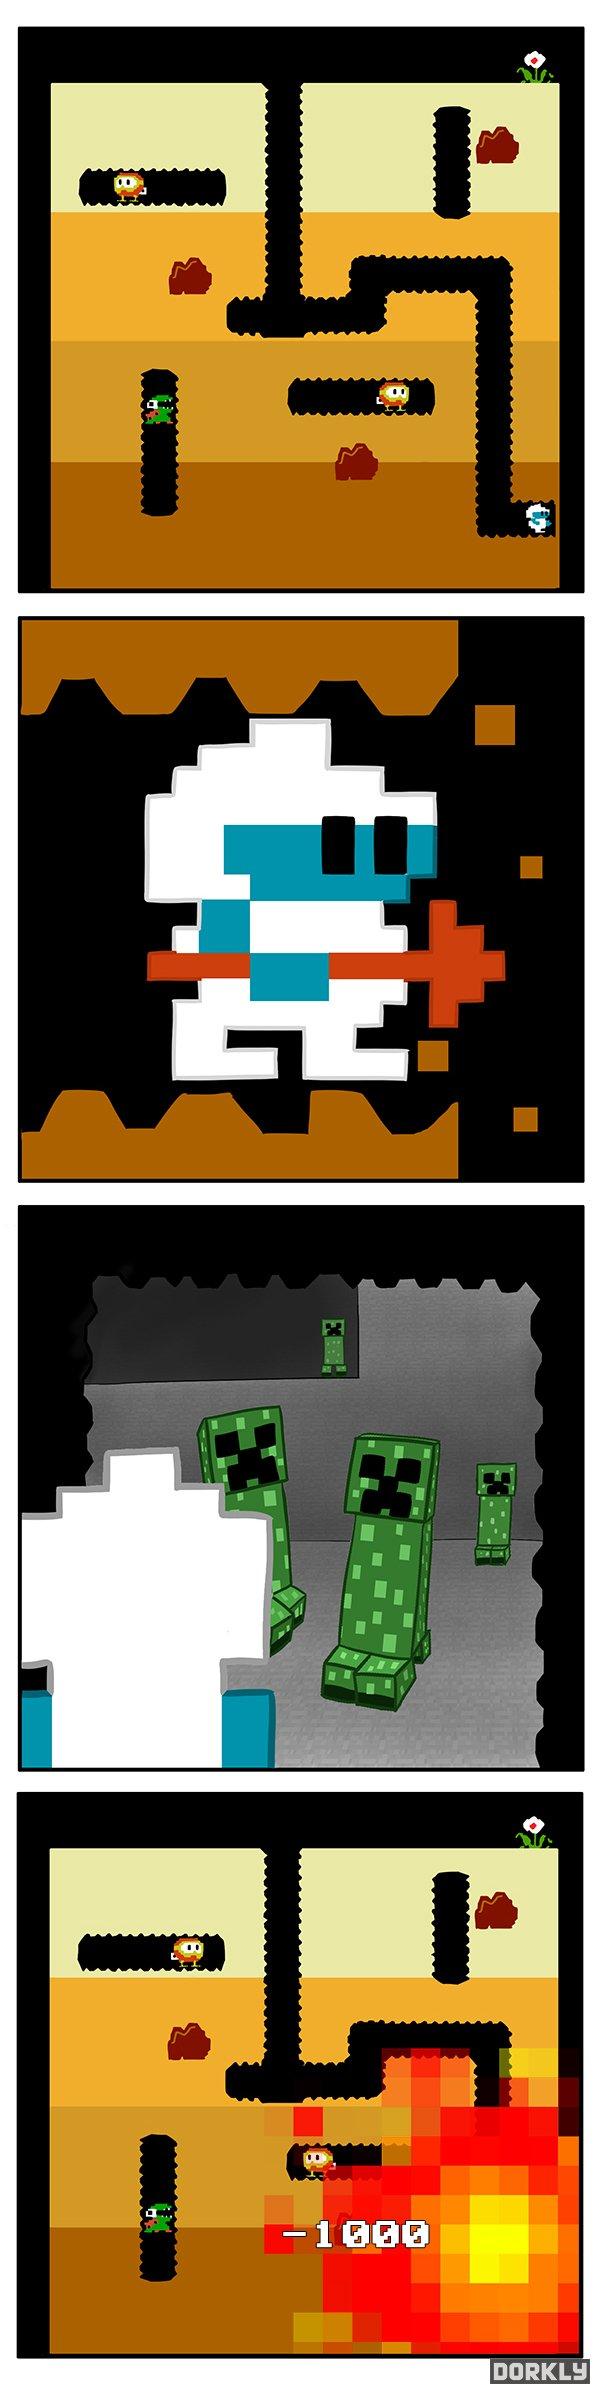 aventura minera